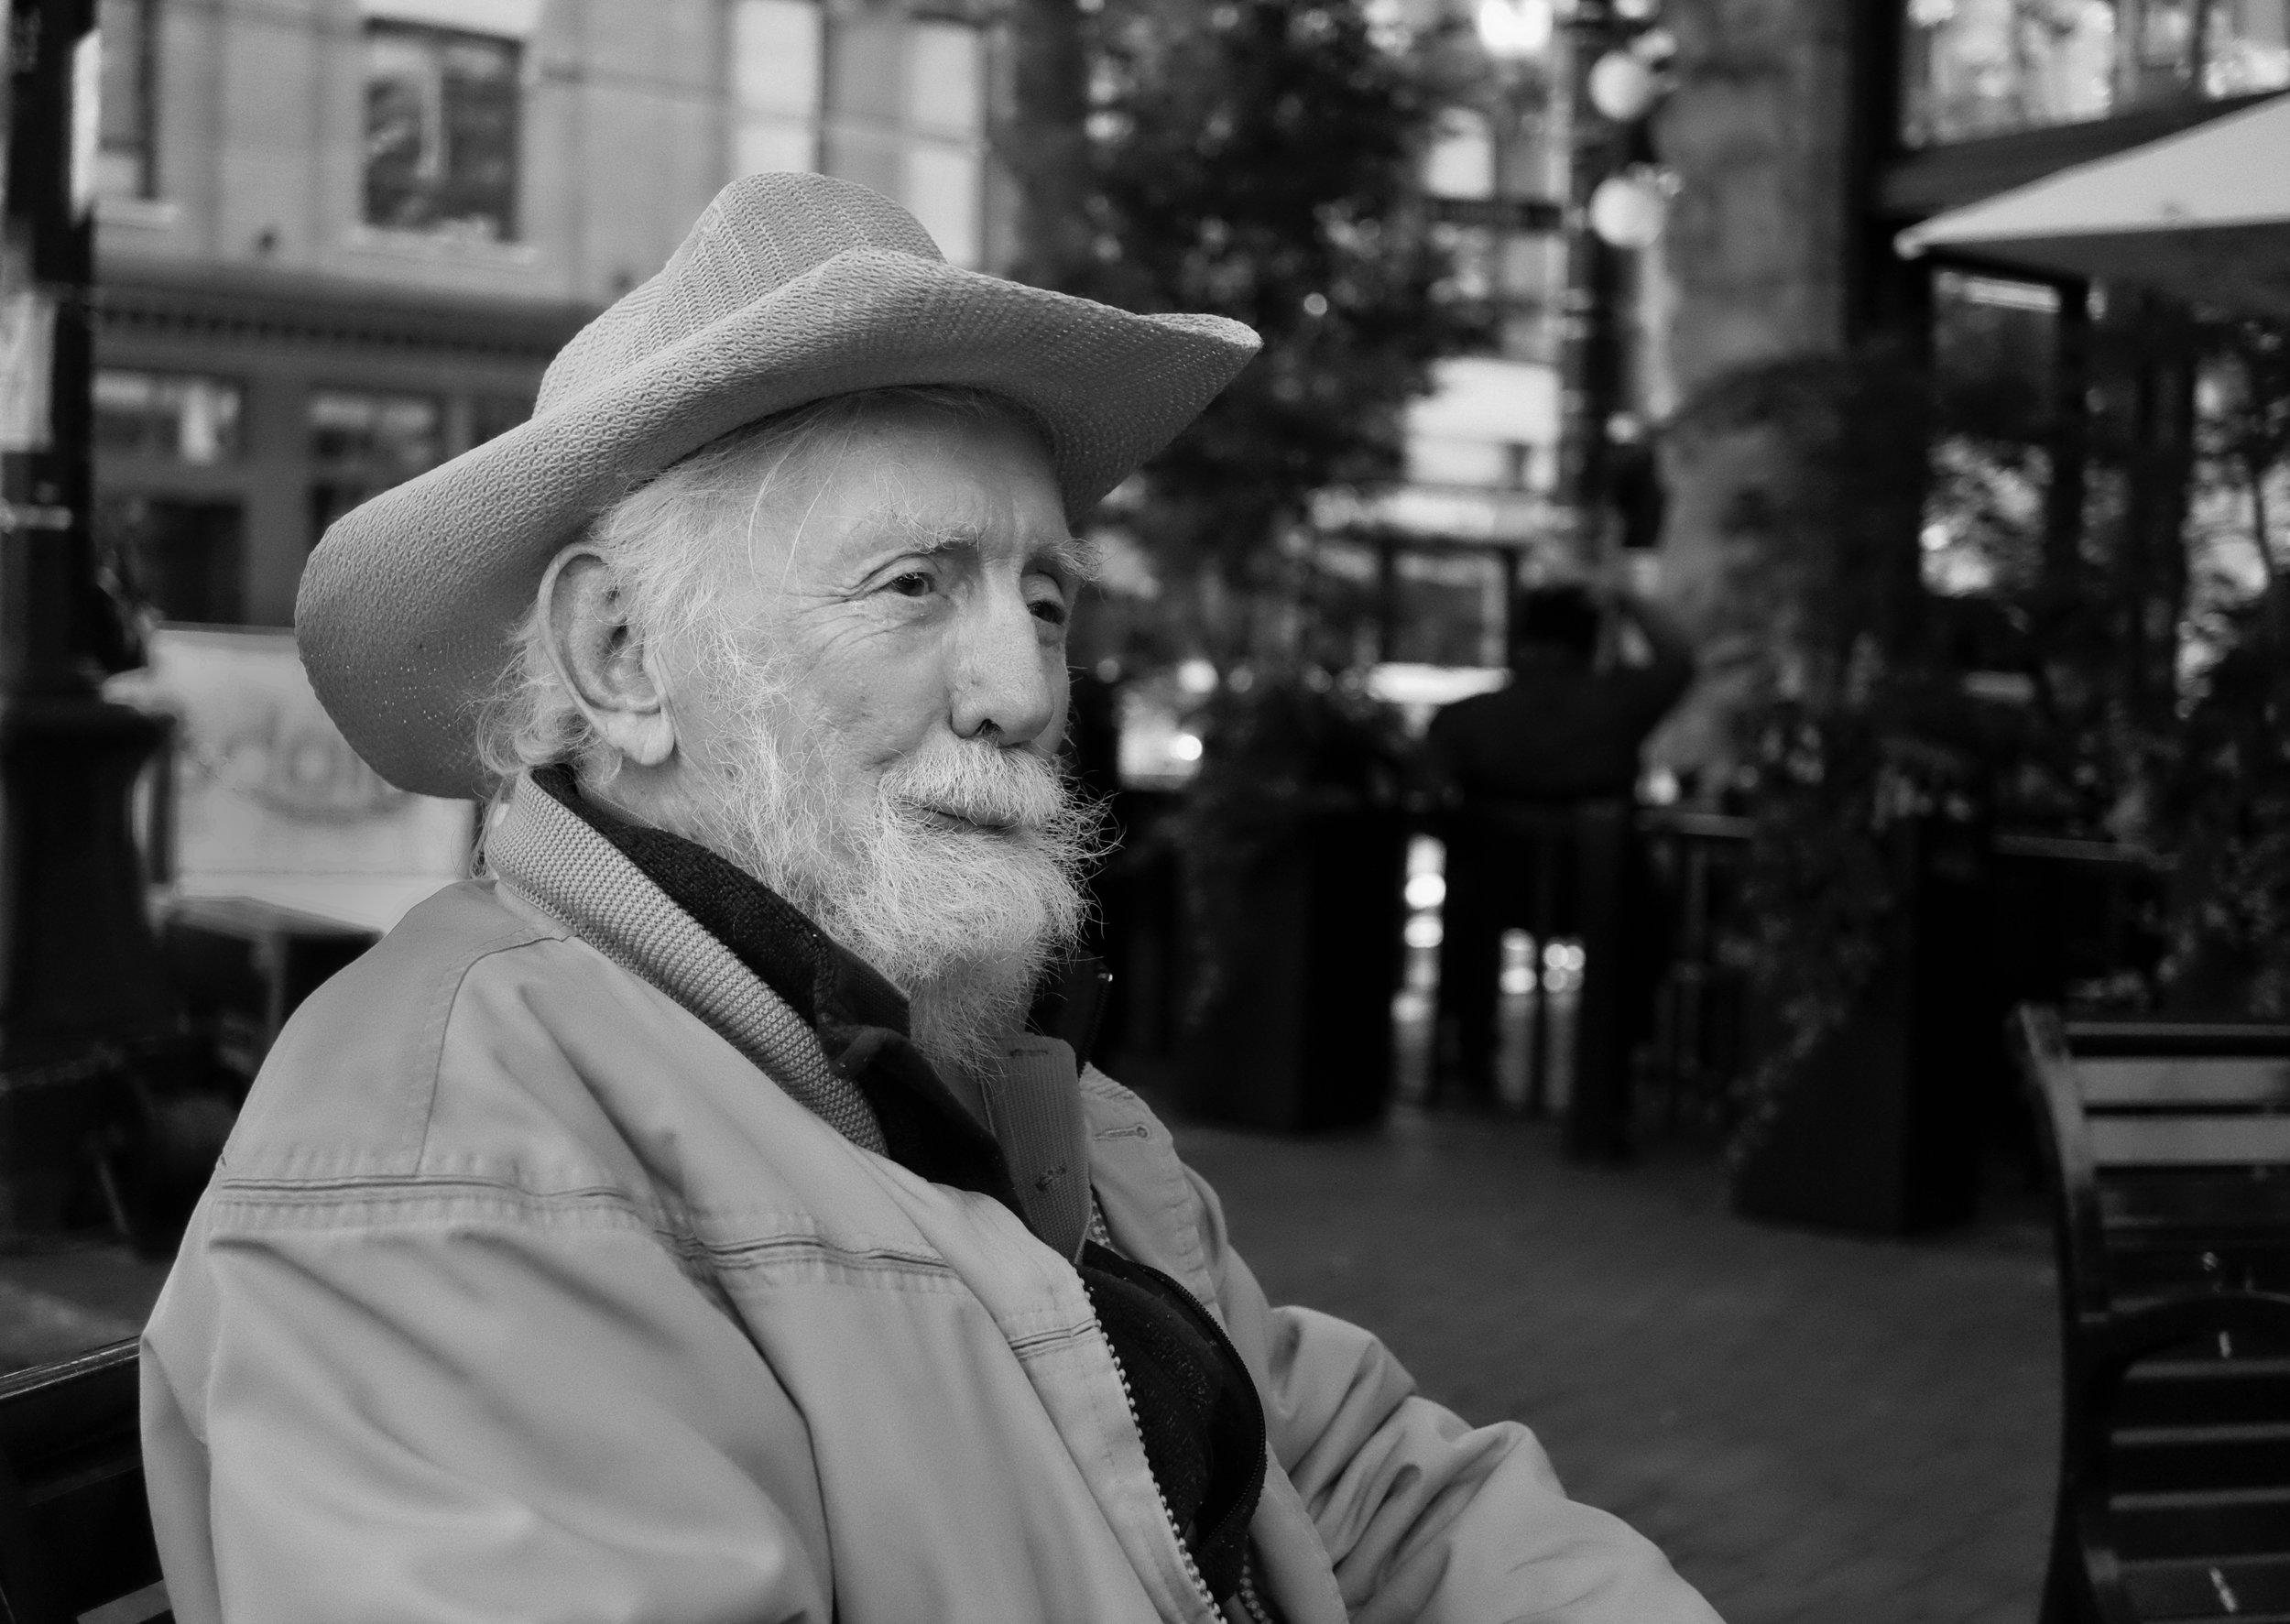 2016-07-13 at 16-21-04 Beard, Face, Hat, Man, Old Guy, Street, Vancouver.jpg